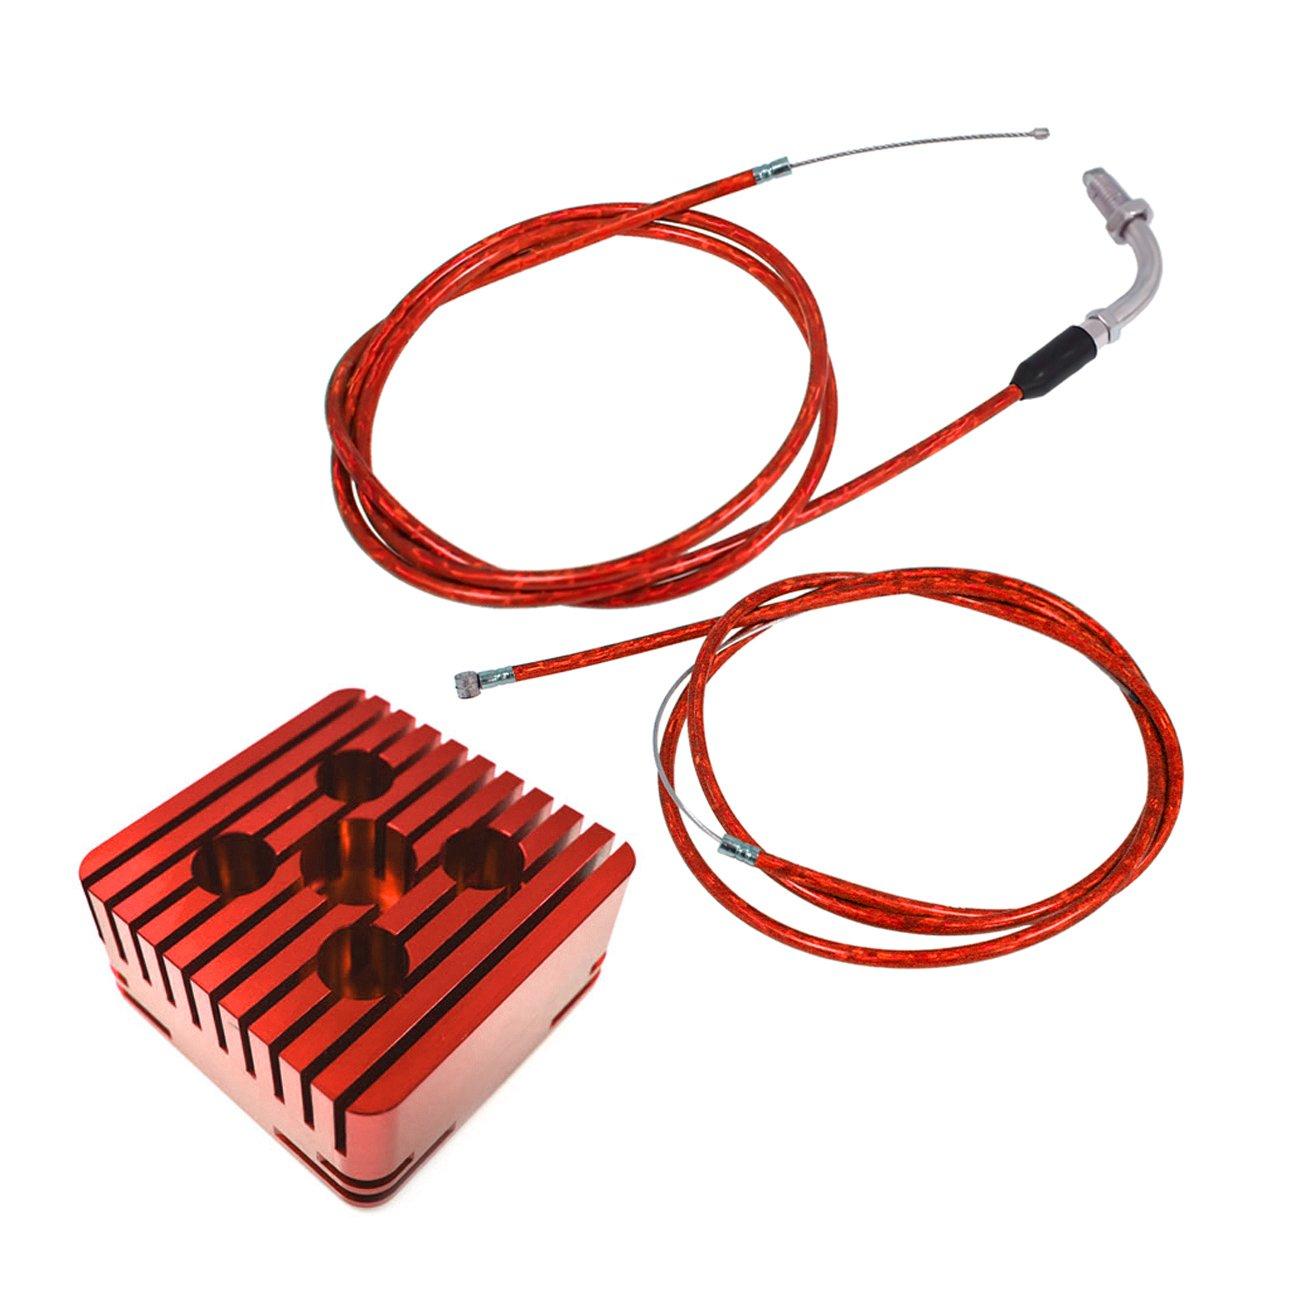 Northtiger Red CNC Square Cylinder Head & Throttle Line Fit 80cc Engine Motorized Bike